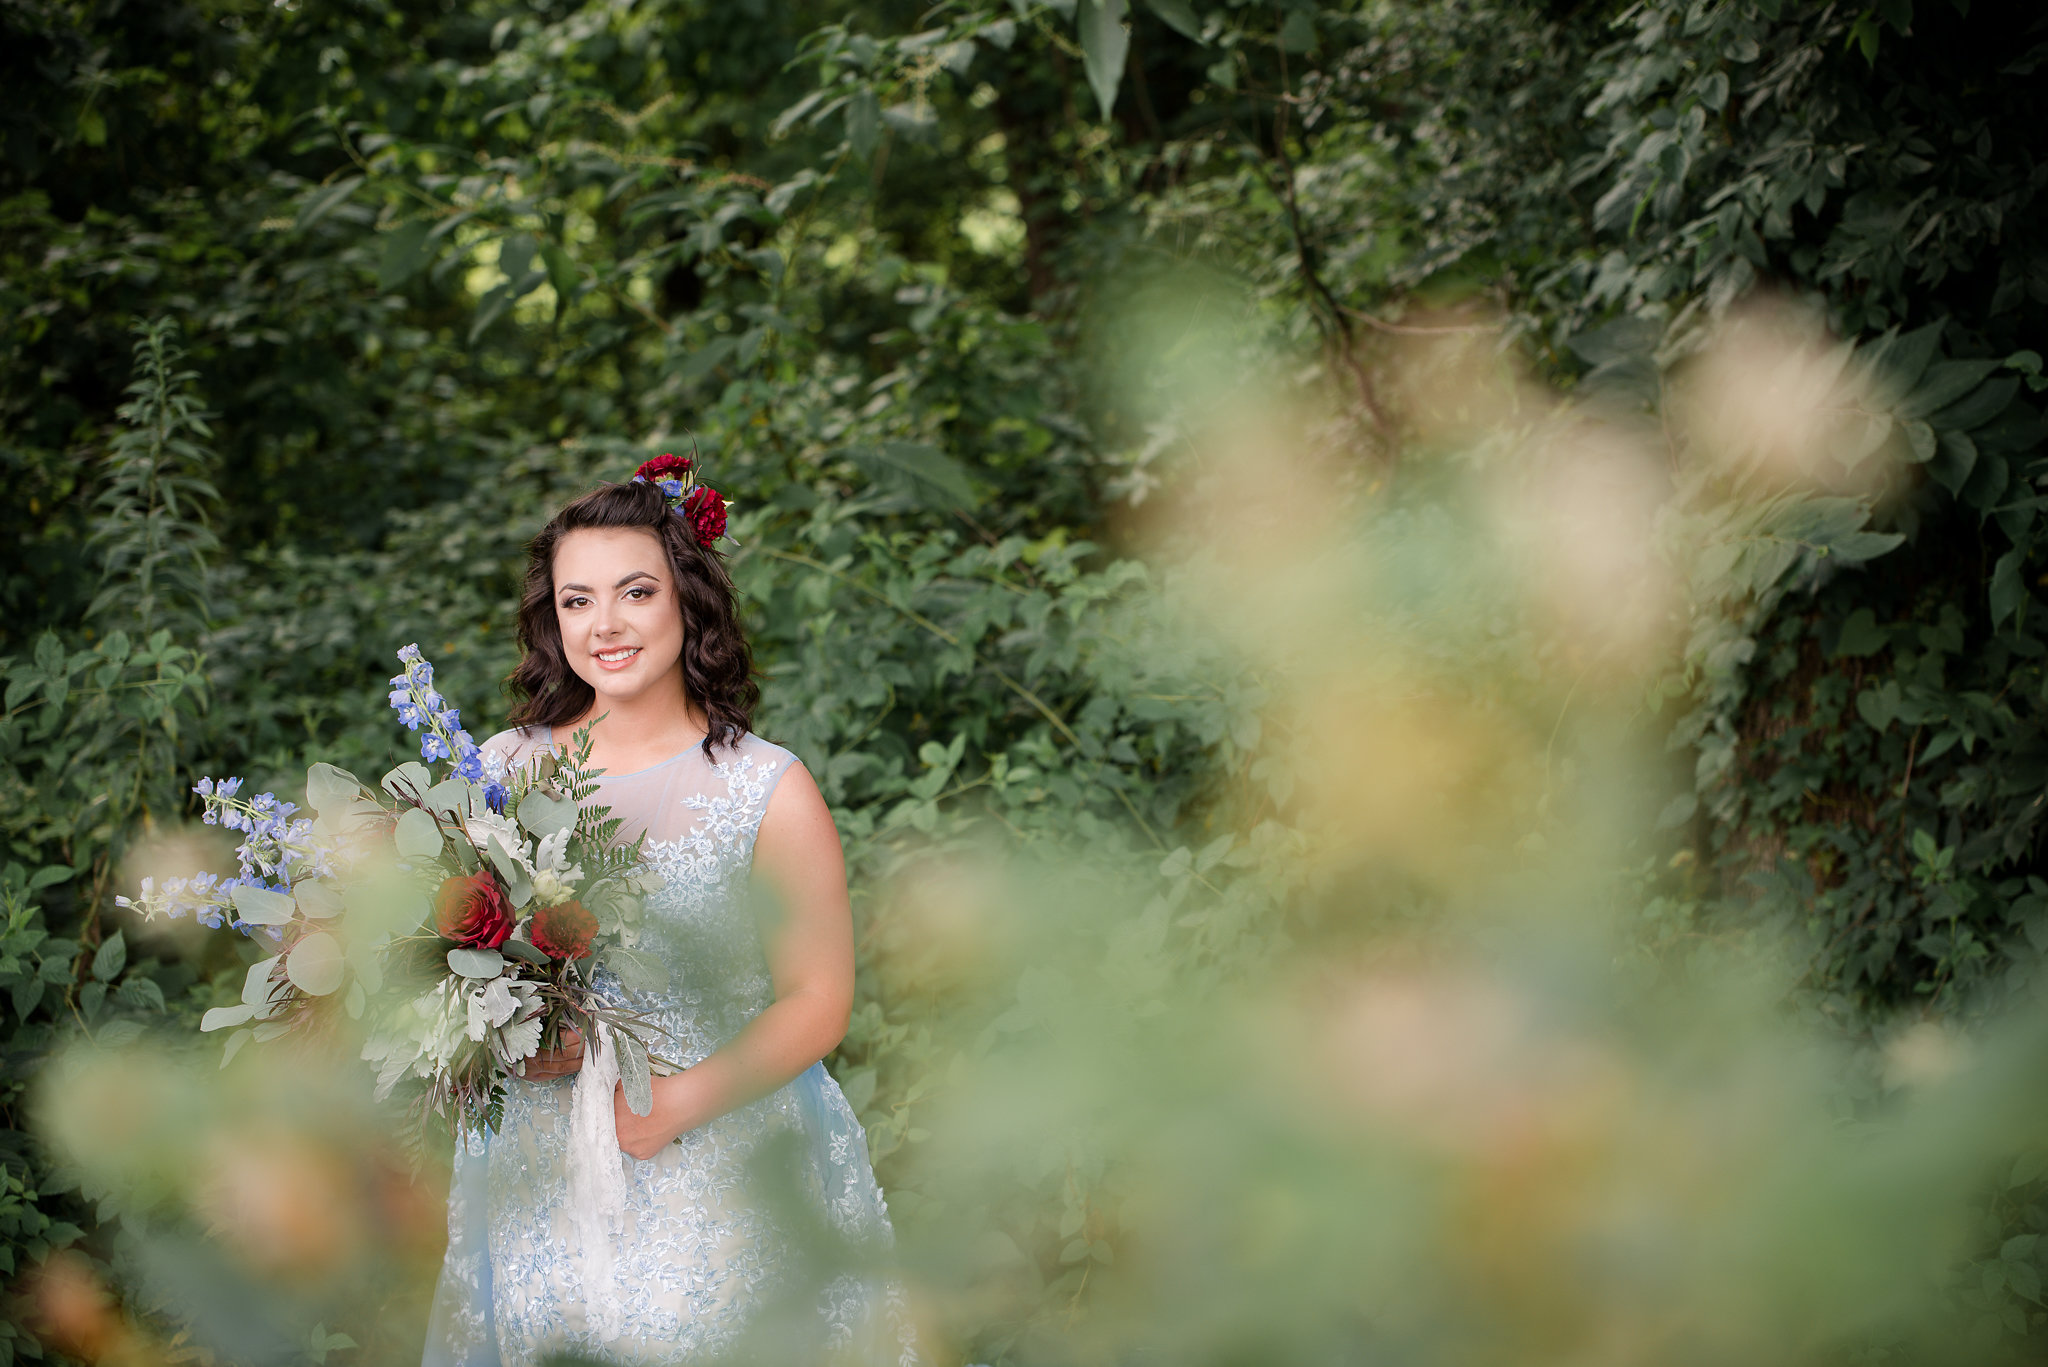 elizabeth-hayden-photography-wedding-arkansas-6042.jpg